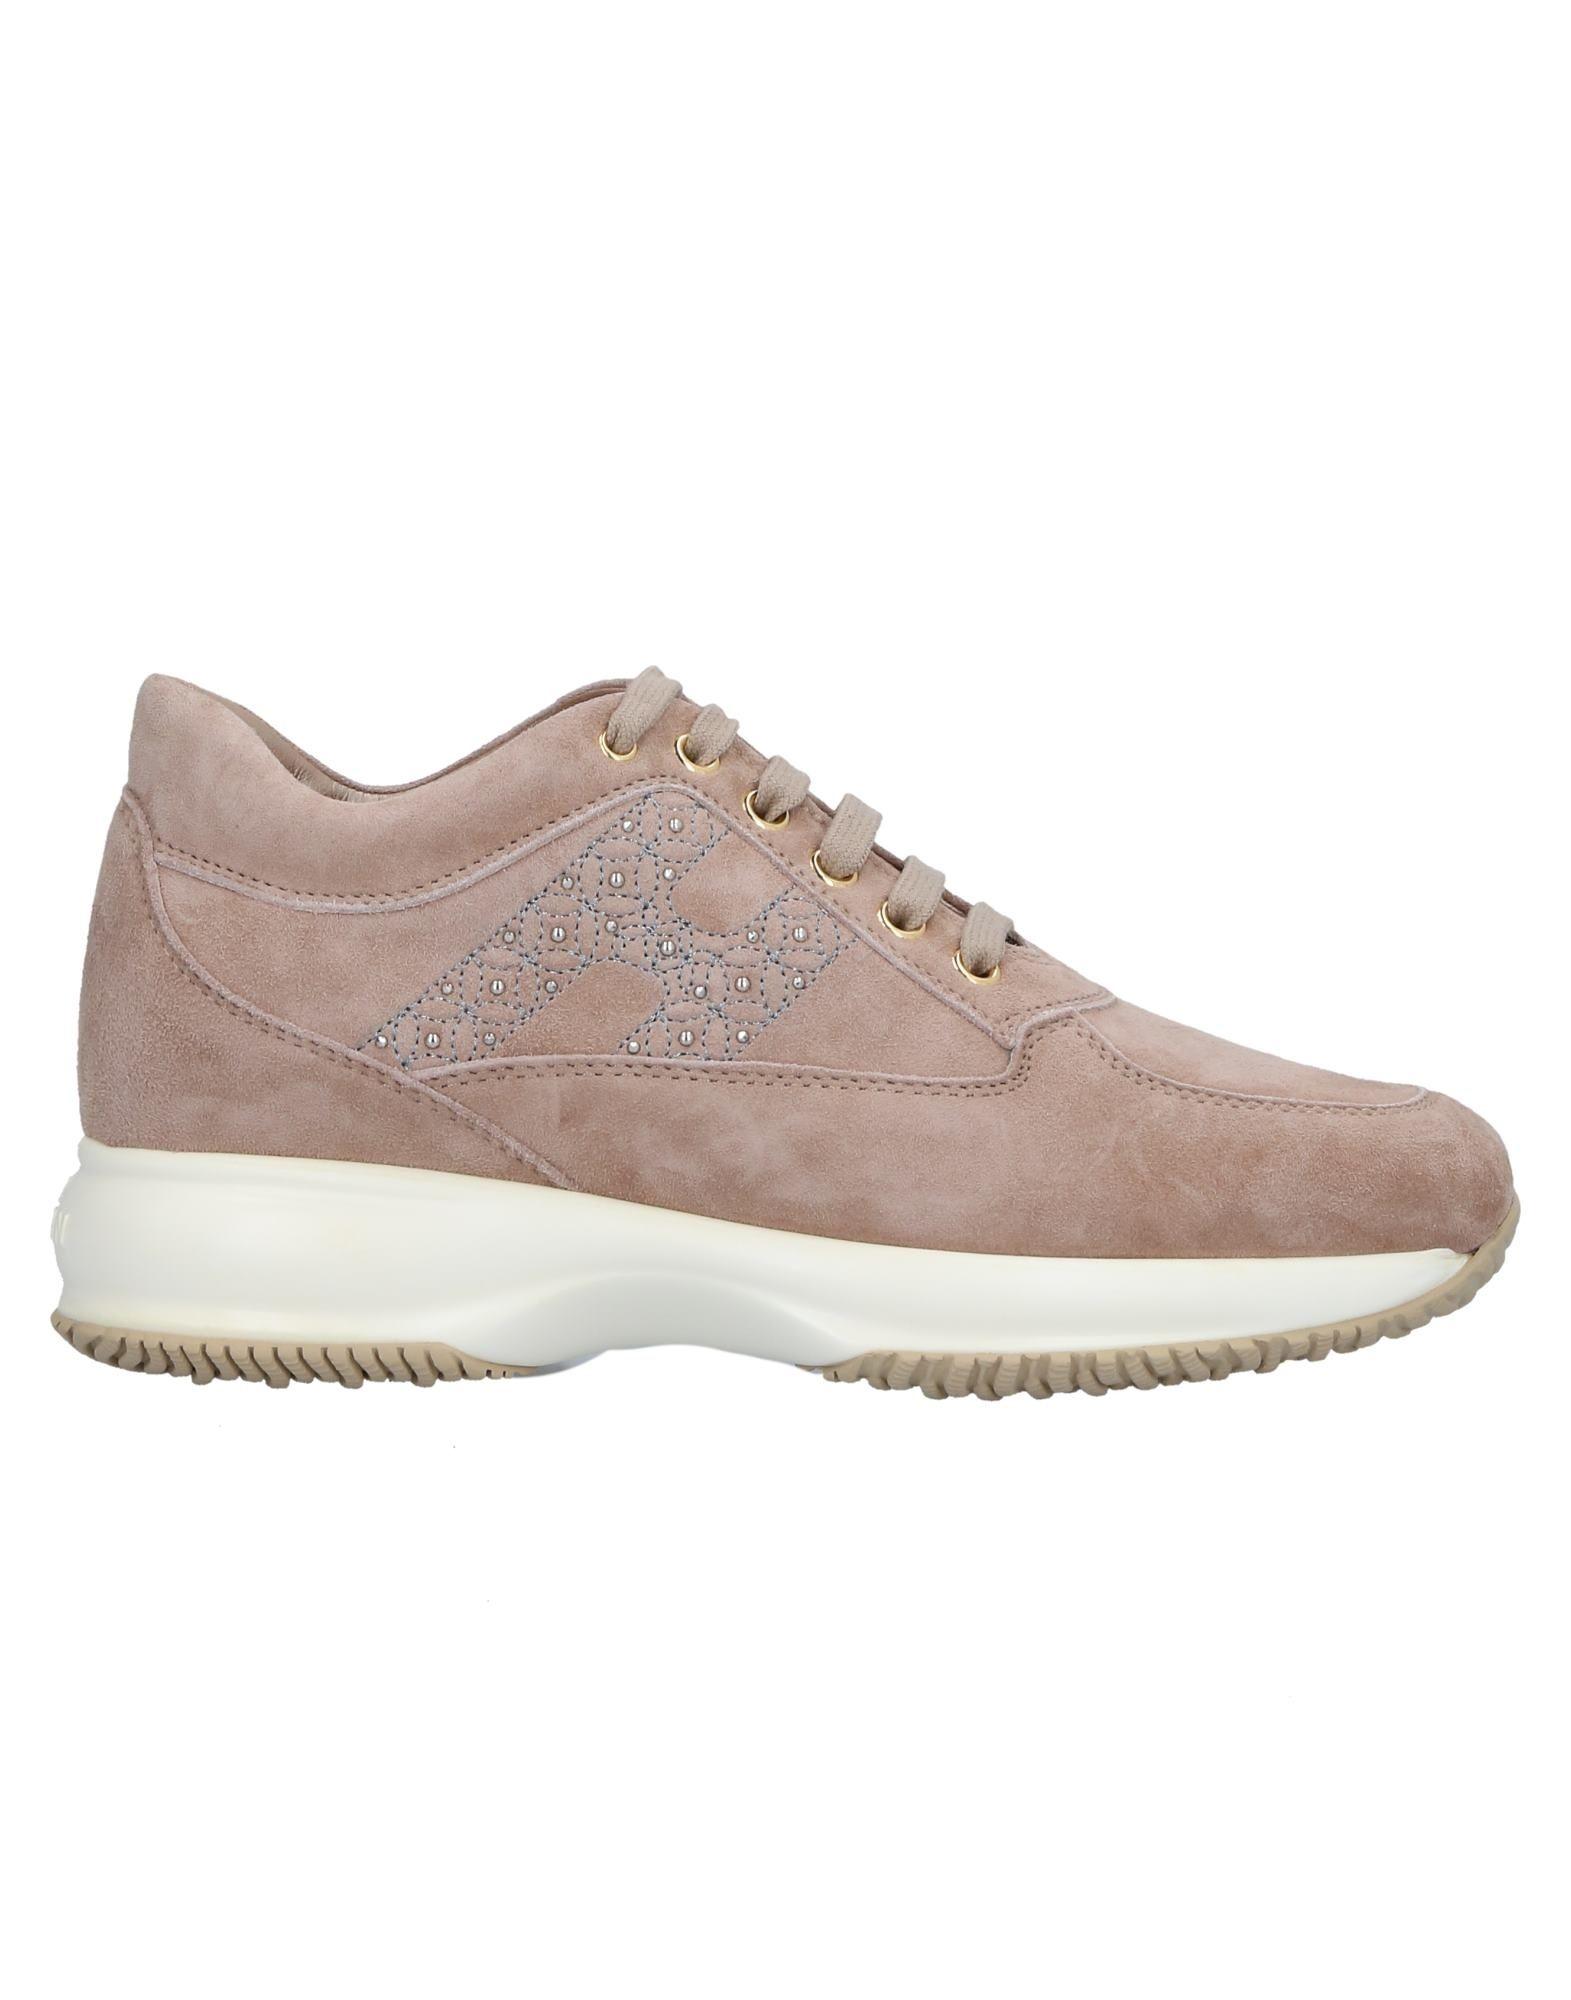 Moda Sneakers Hogan Donna - 11542199HV